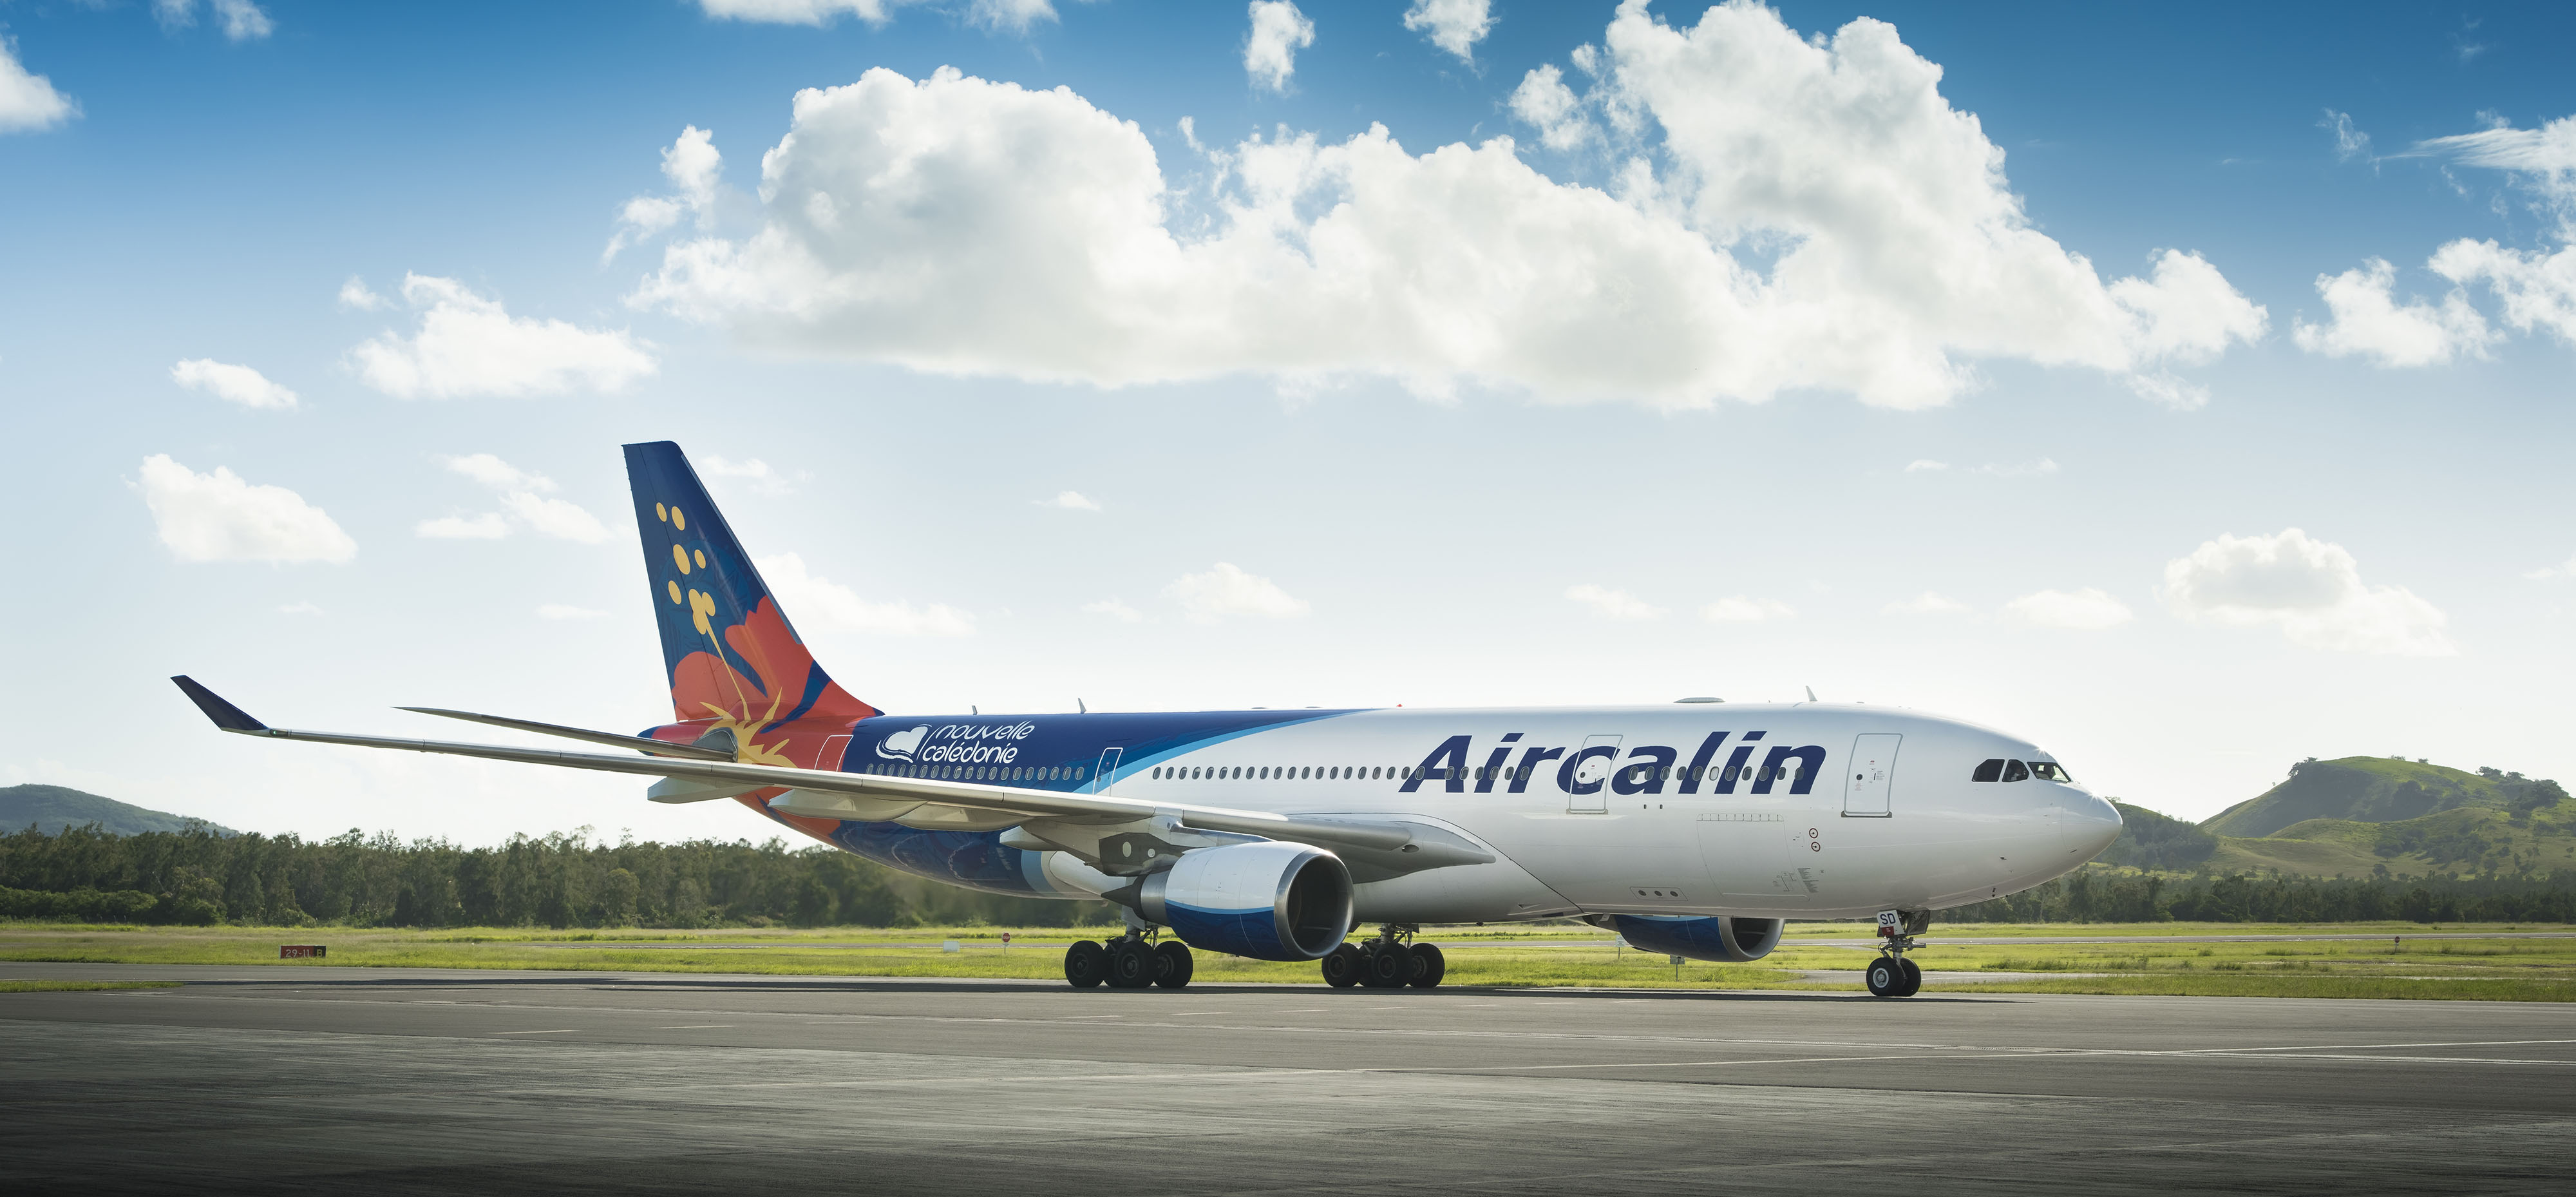 Aircalin: Le vol Noumea Papeete du 8 octobre retardé